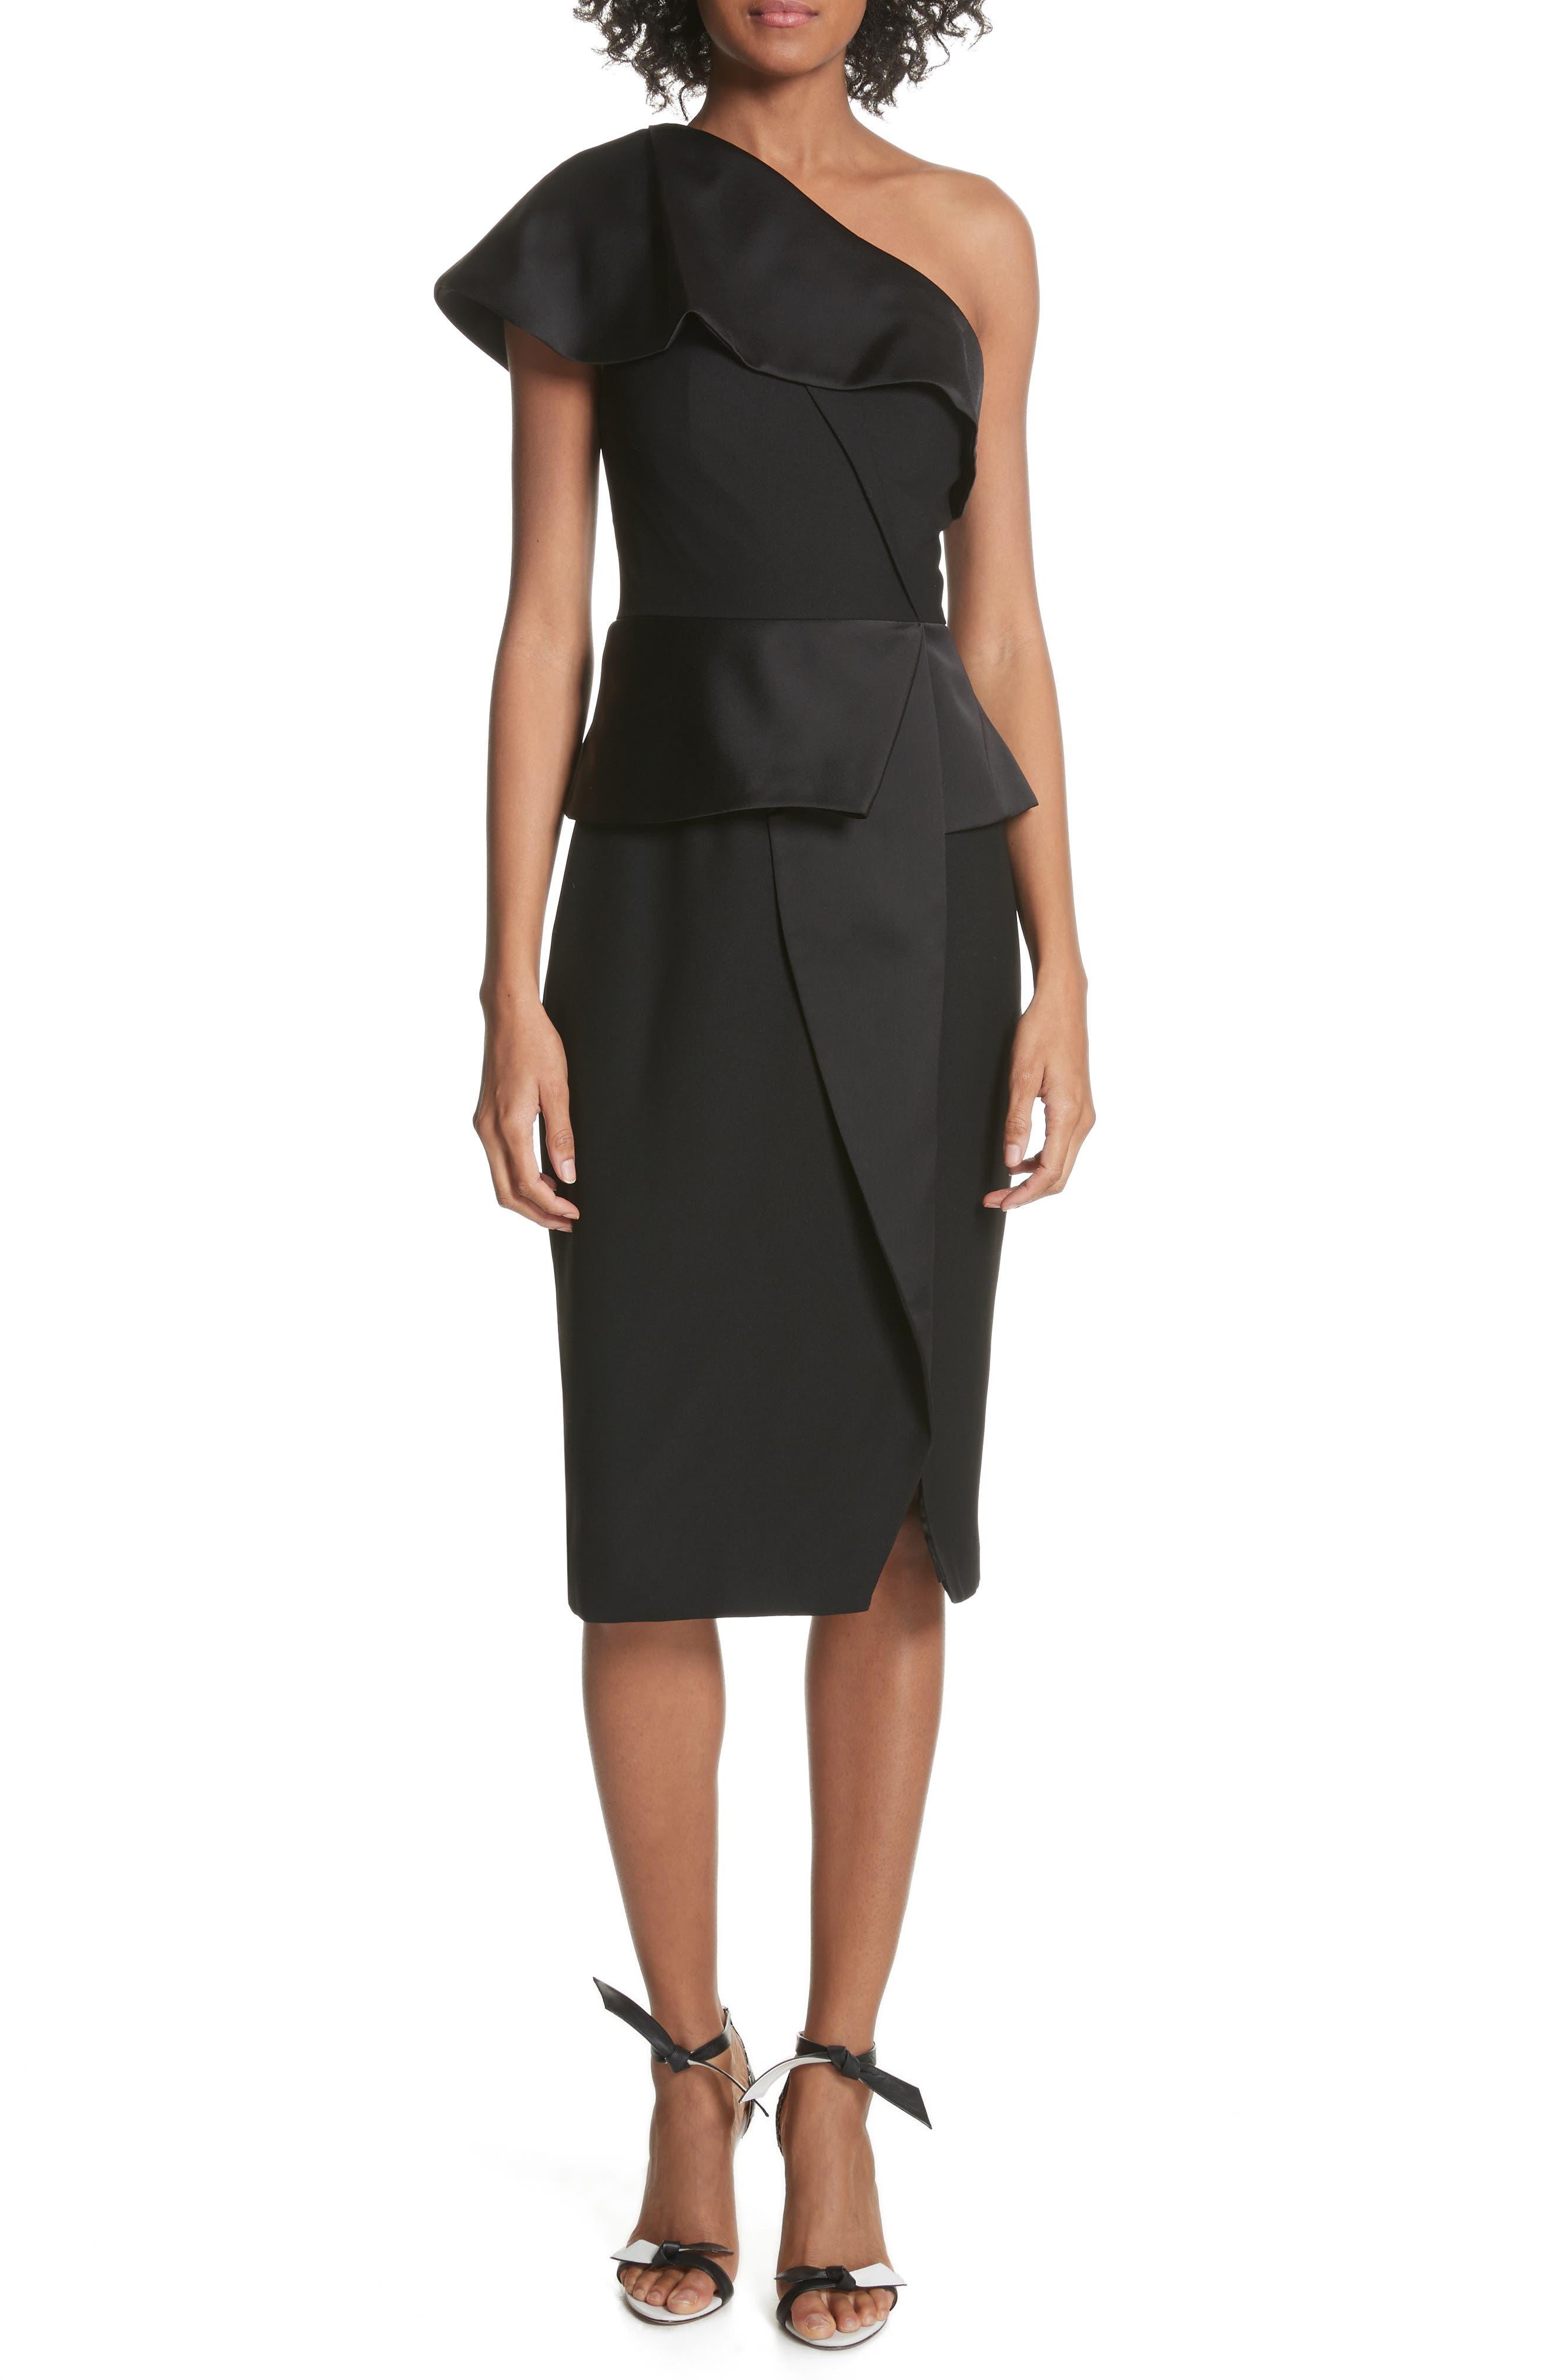 Alternate Image 1 Selected - Ted Baker London Pana One-Shoulder Peplum Sheath Dress